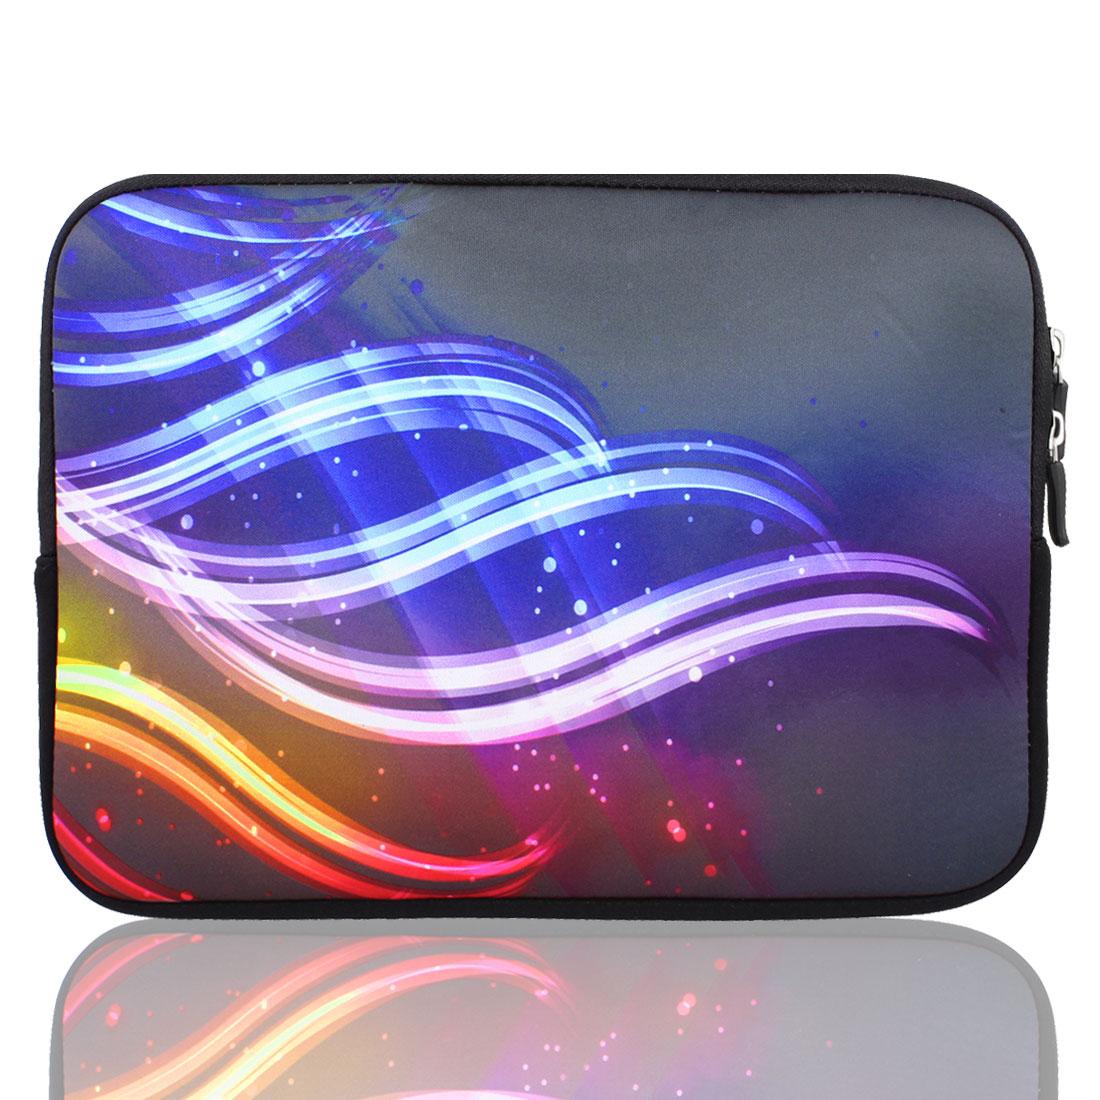 "Vine Print 10"" 10.1"" 10.2"" Neoprene Notebook Laptop Sleeve Bag Case"